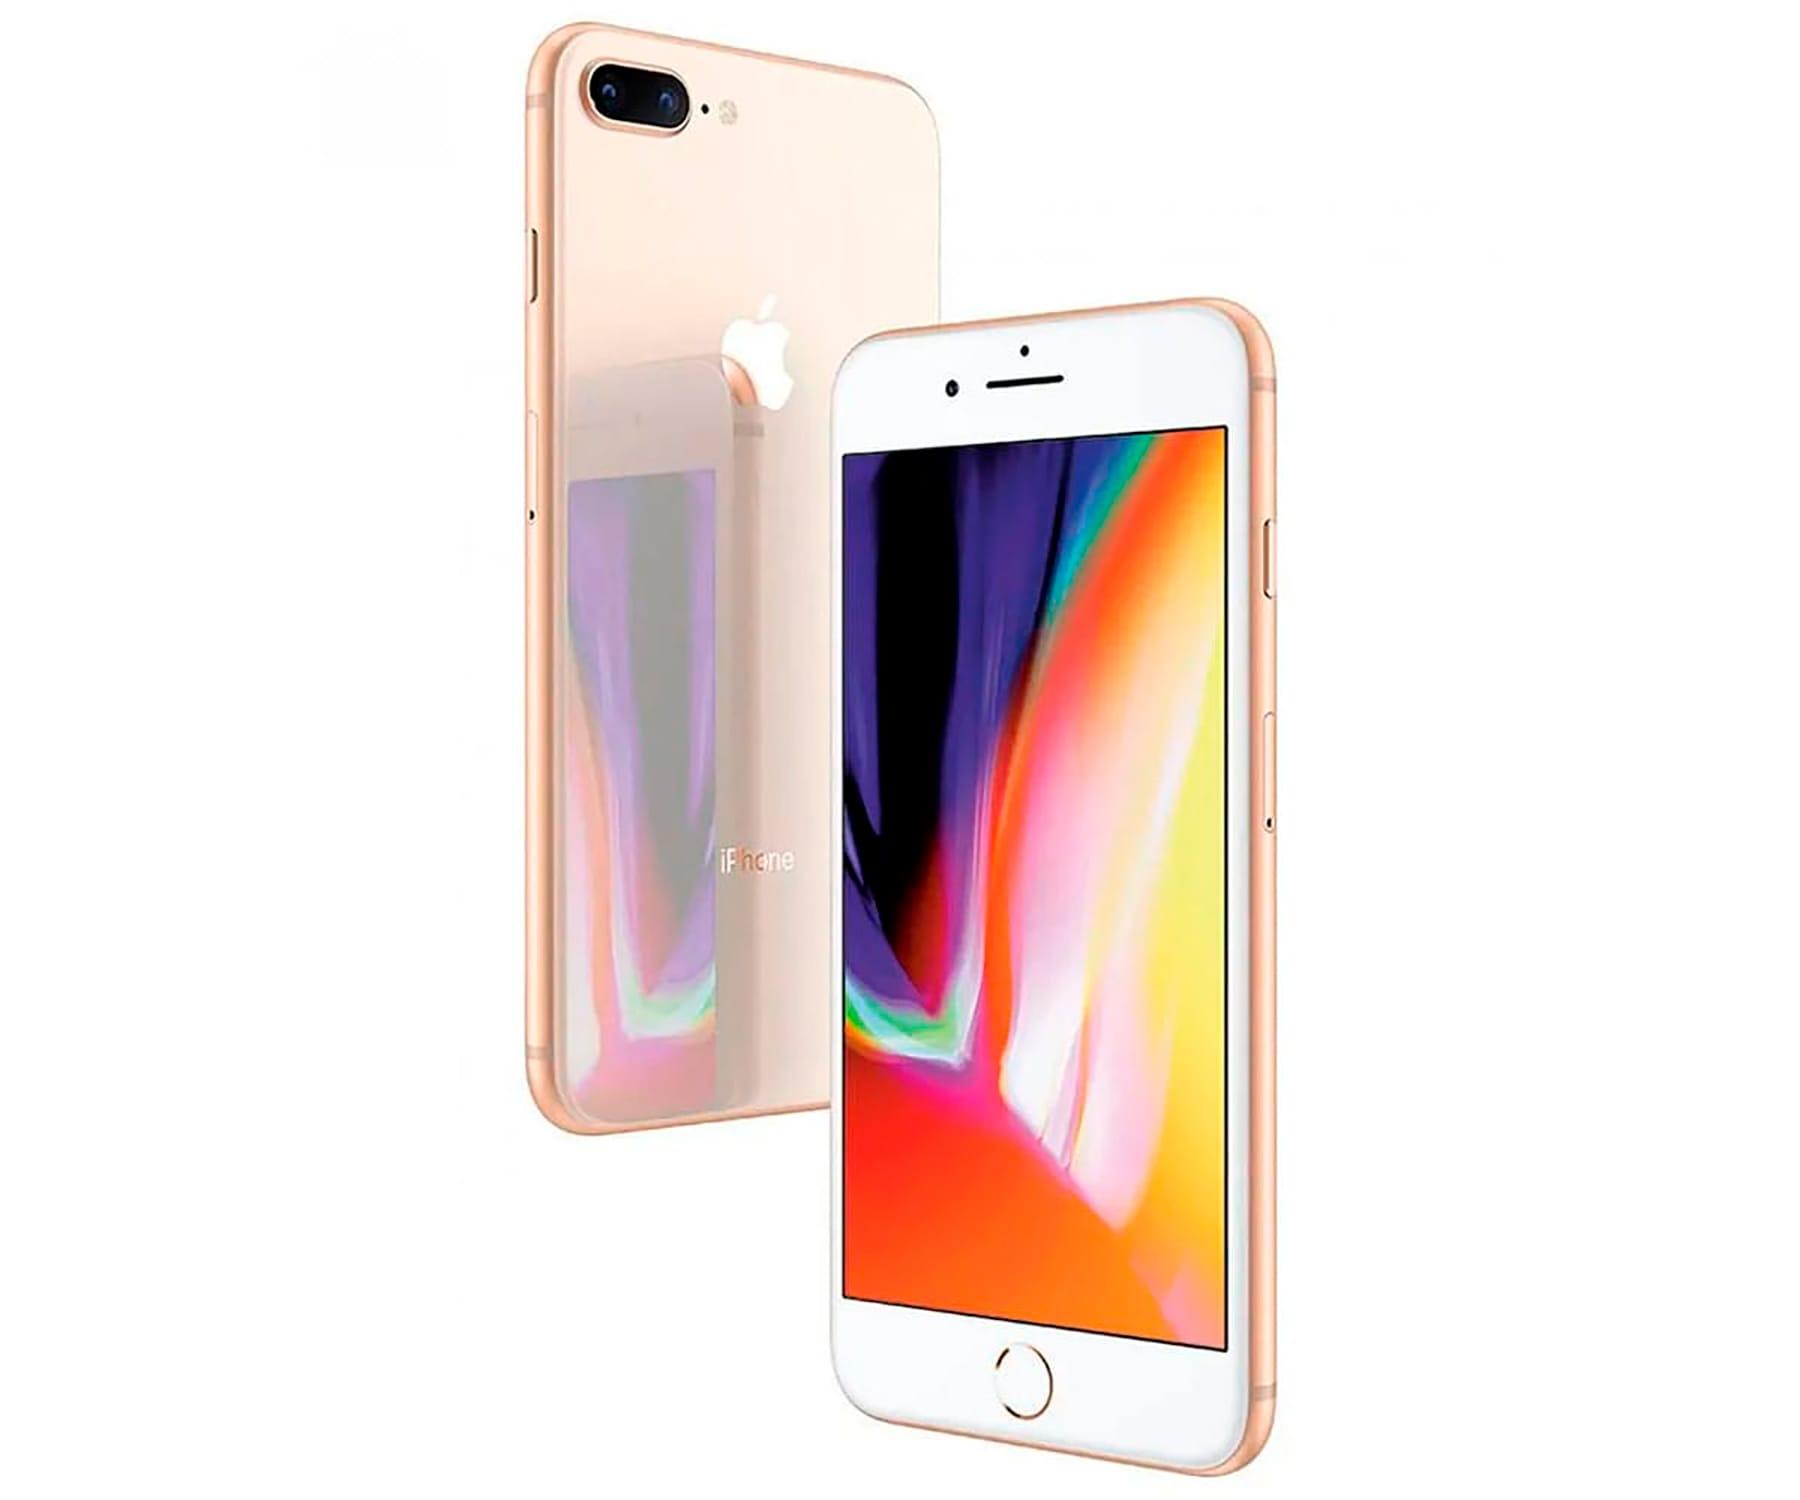 APPLE IPHONE 8 PLUS 64GB ORO REACONDICIONADO CPO MÓVIL 4G 5.5'' RETINA FHD/6CORE/64GB/3GB RAM/12MP+12MP/7MP